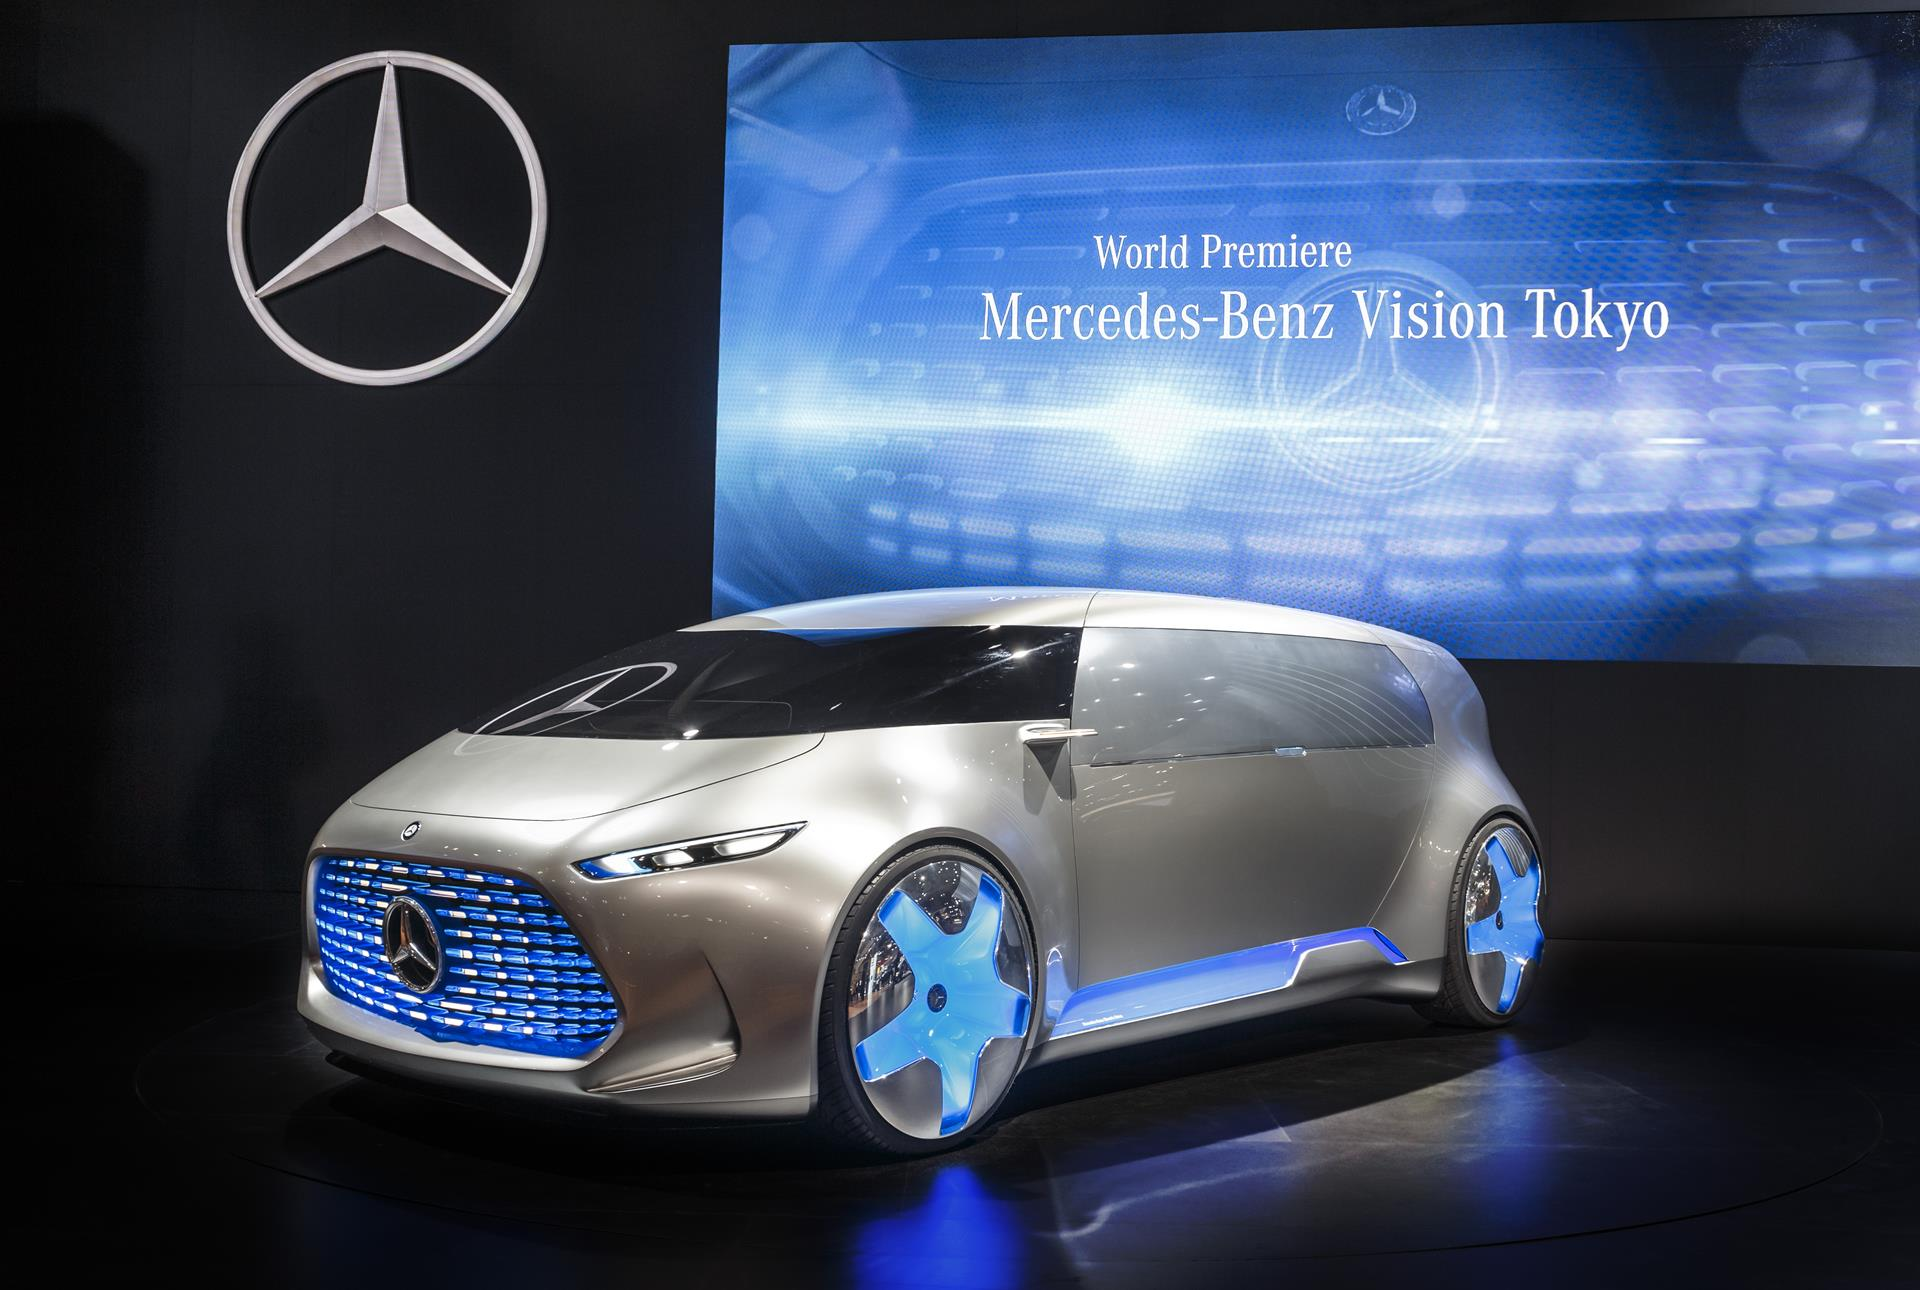 2015 mercedes benz vision tokyo concept pictures news for Mercedes benz vision